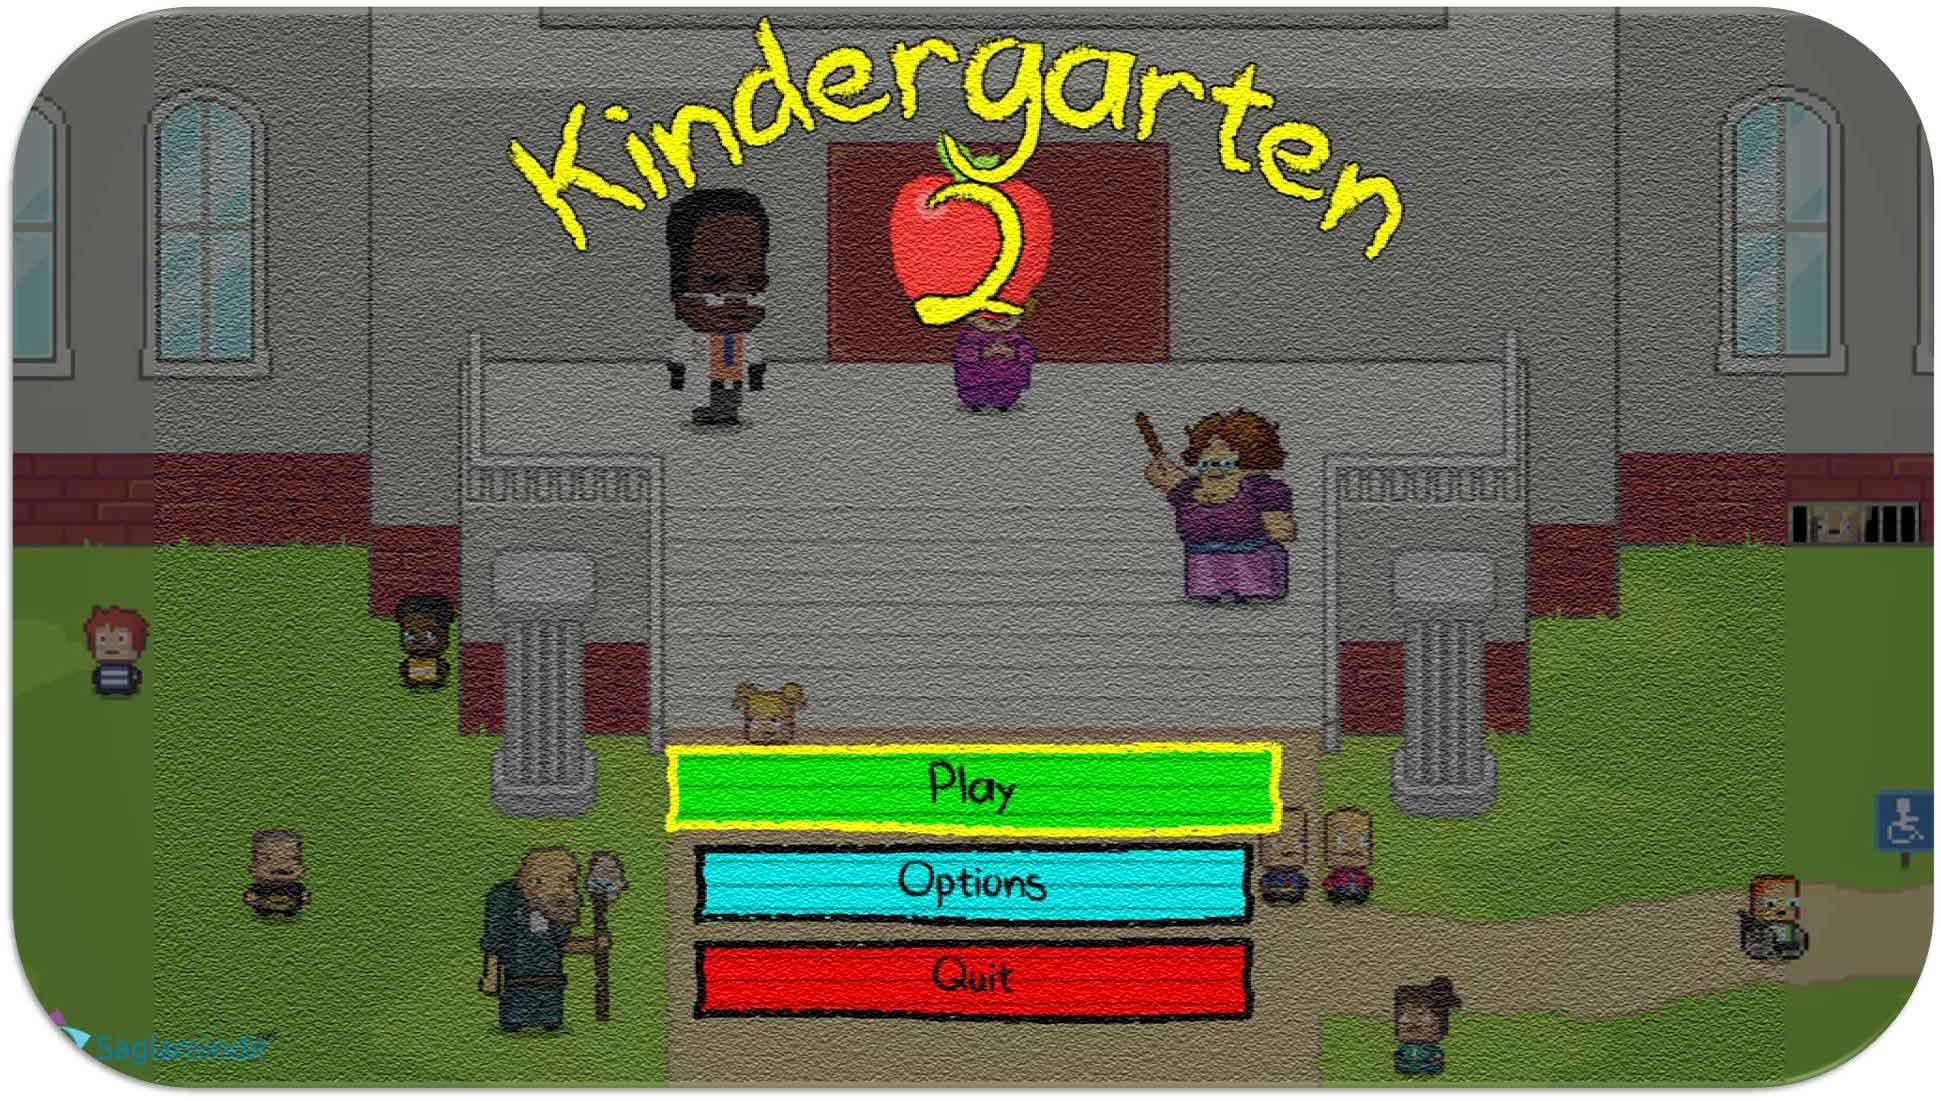 kindergarten 2 saglamindir